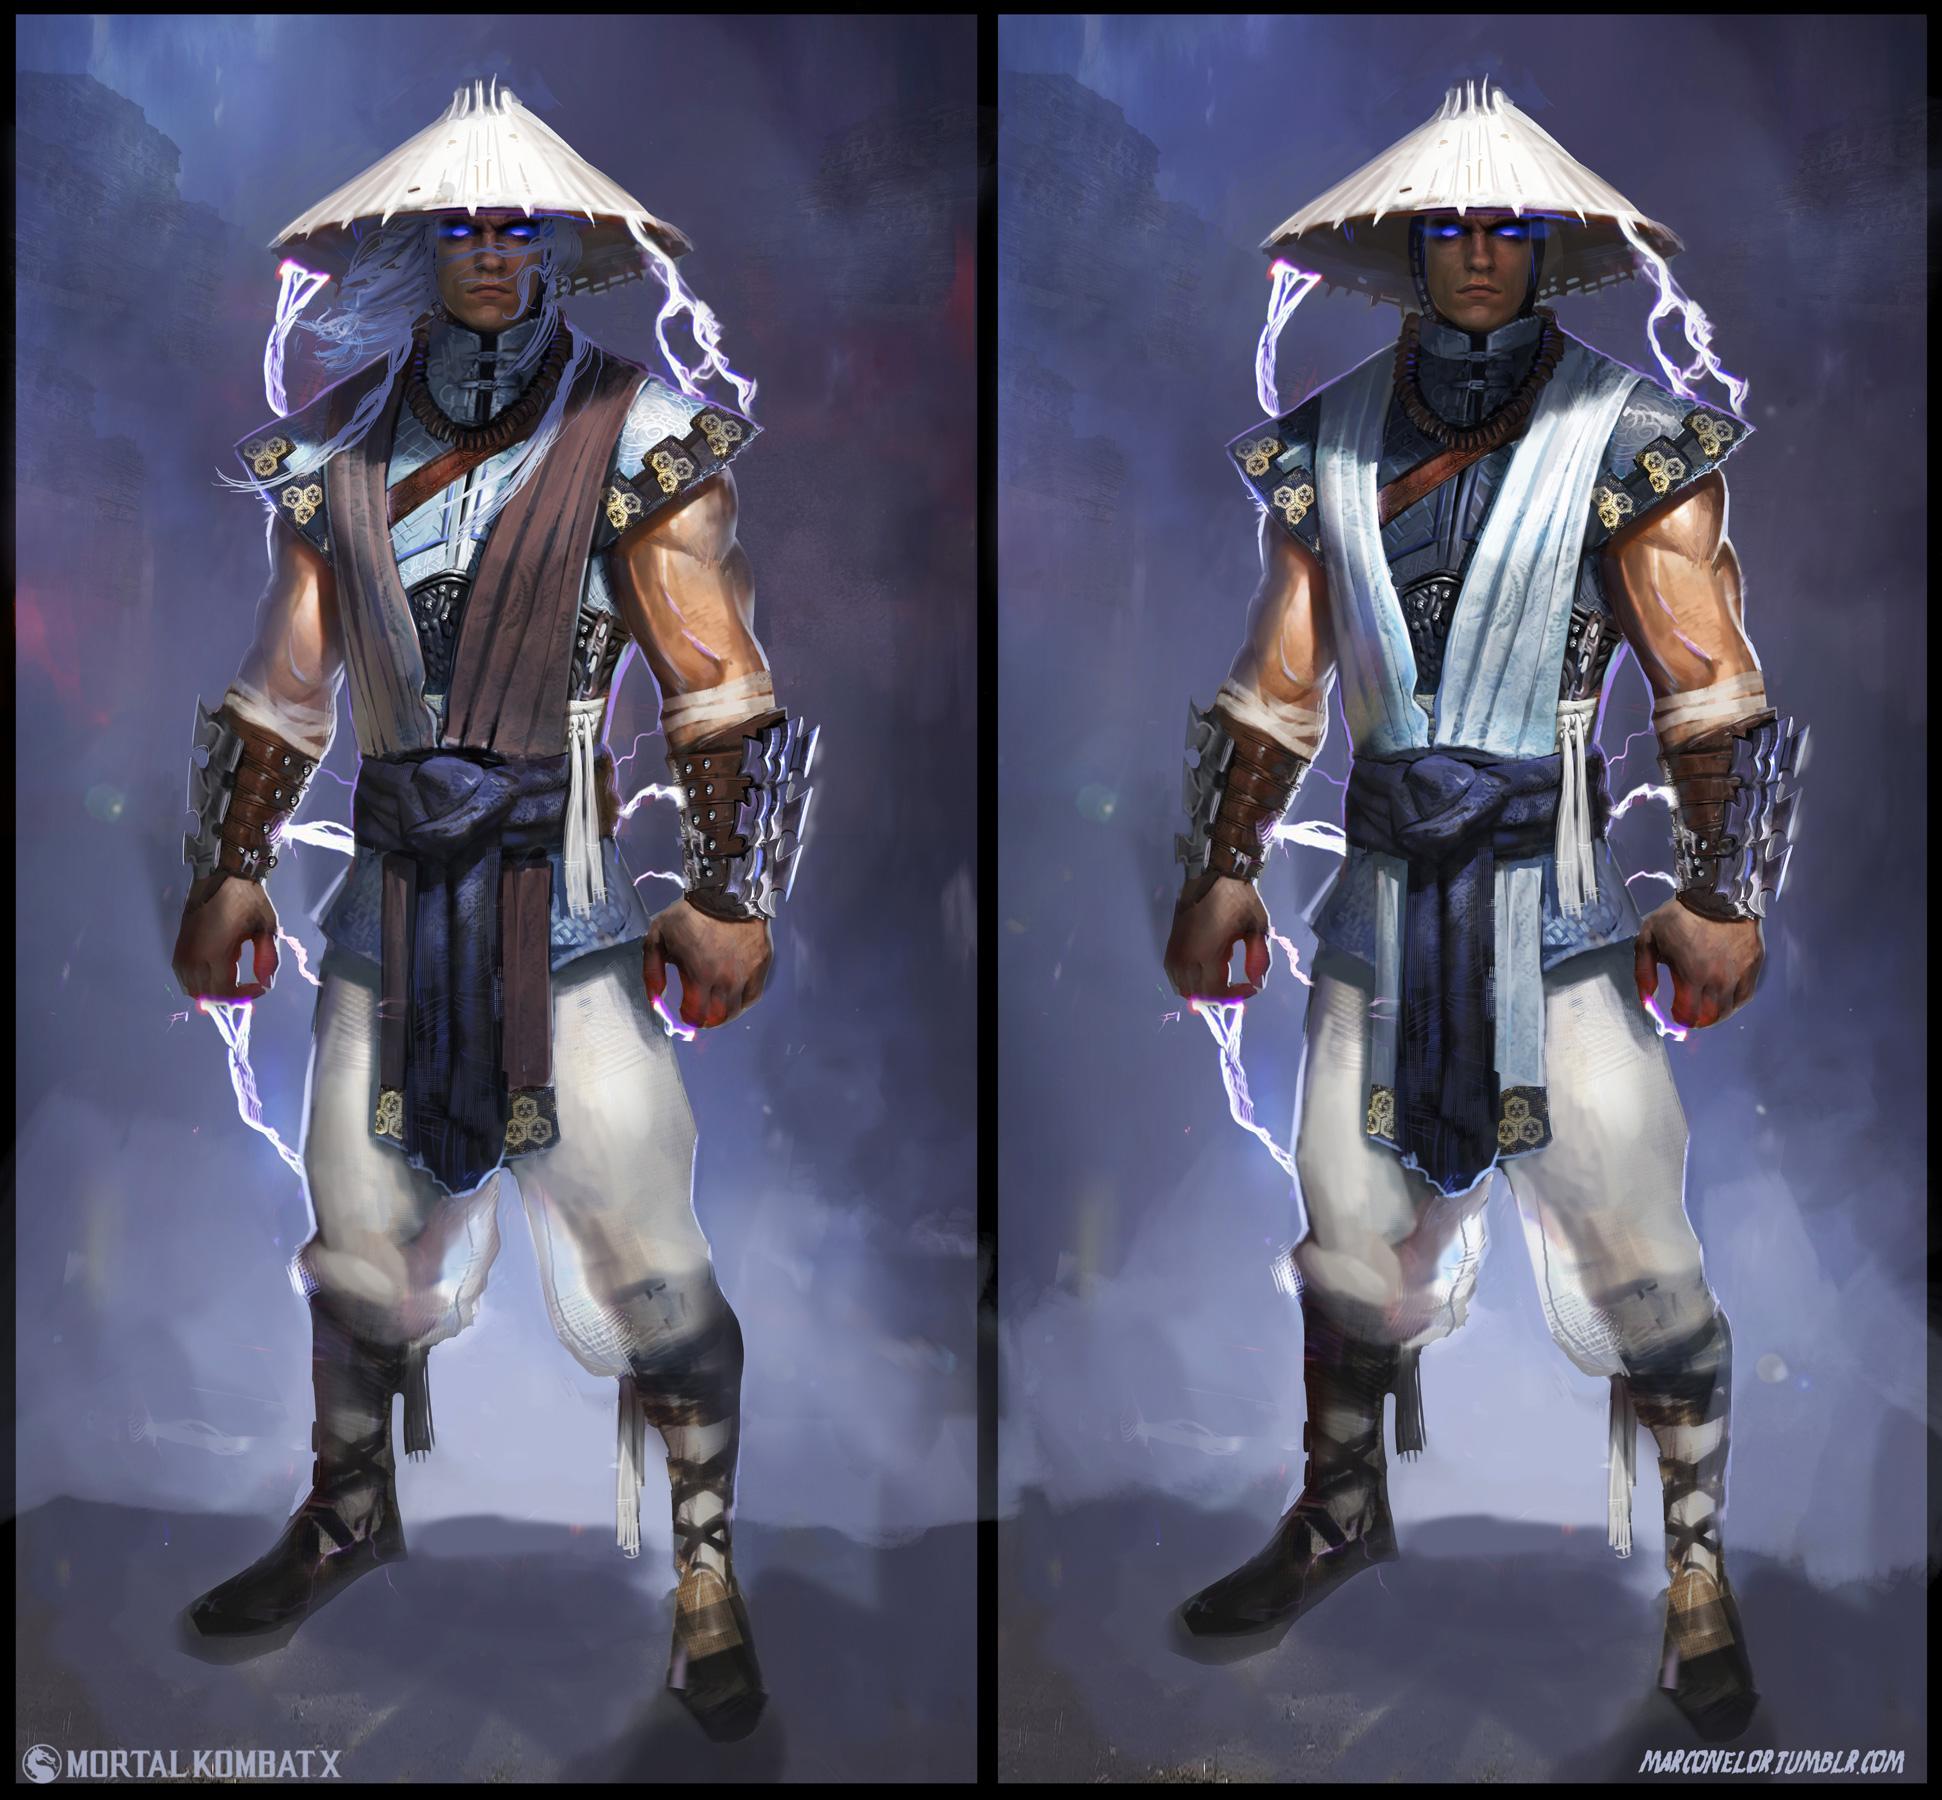 Character Design Mortal Kombat : Mortal kombat on pinterest concept art